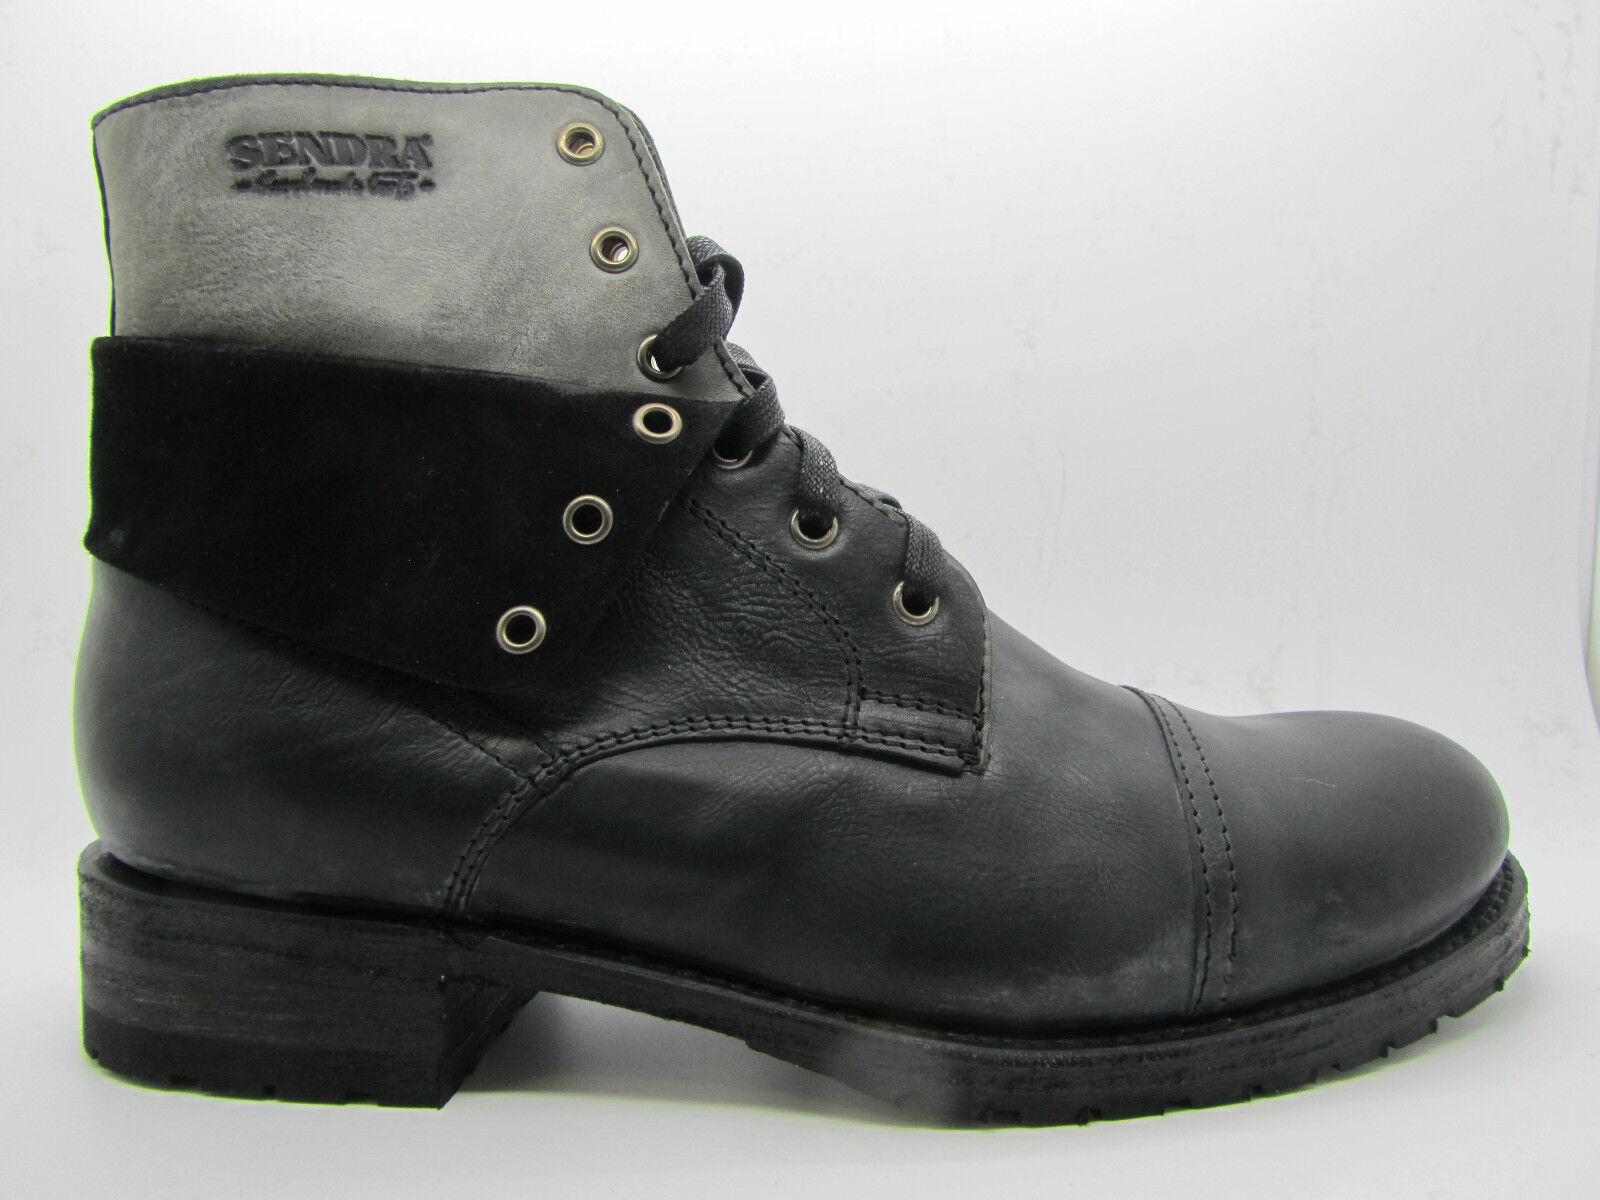 Sendra 11934 Men Ankle Chukka Boots  Bike Black Leather Biker Lace Up